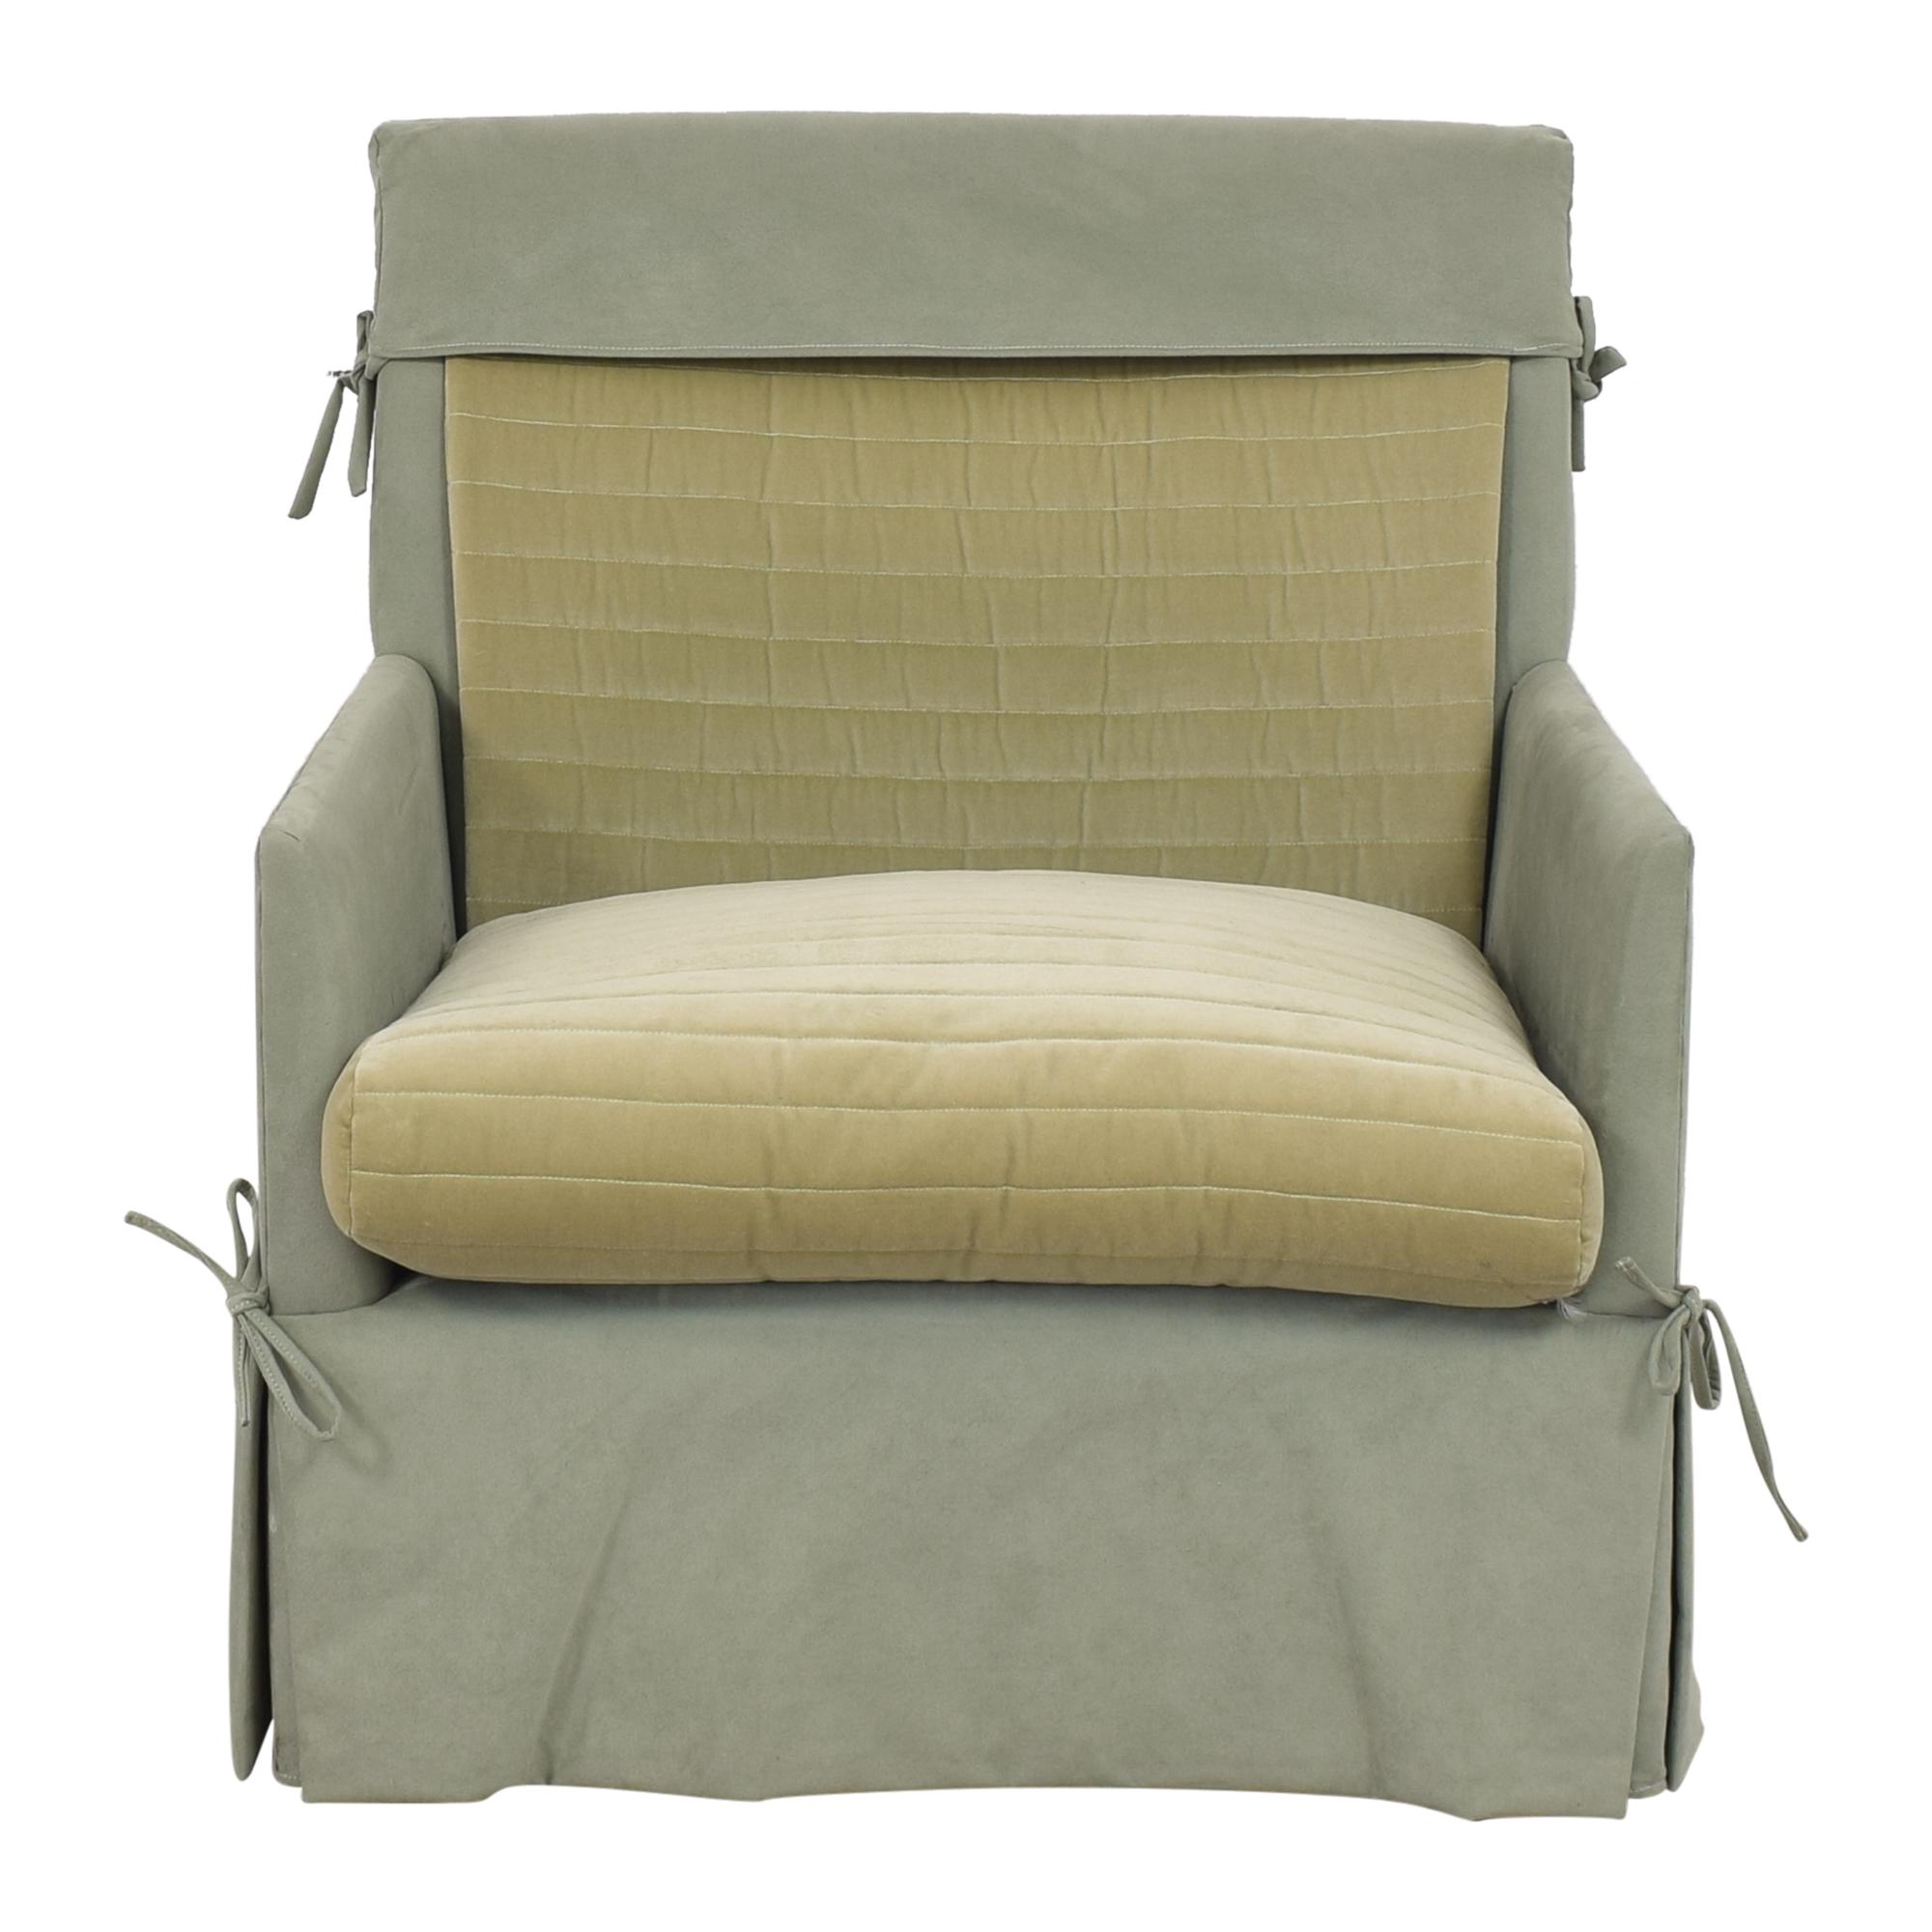 John Saladino John Saladino Skirted Swivel Accent Chair for sale